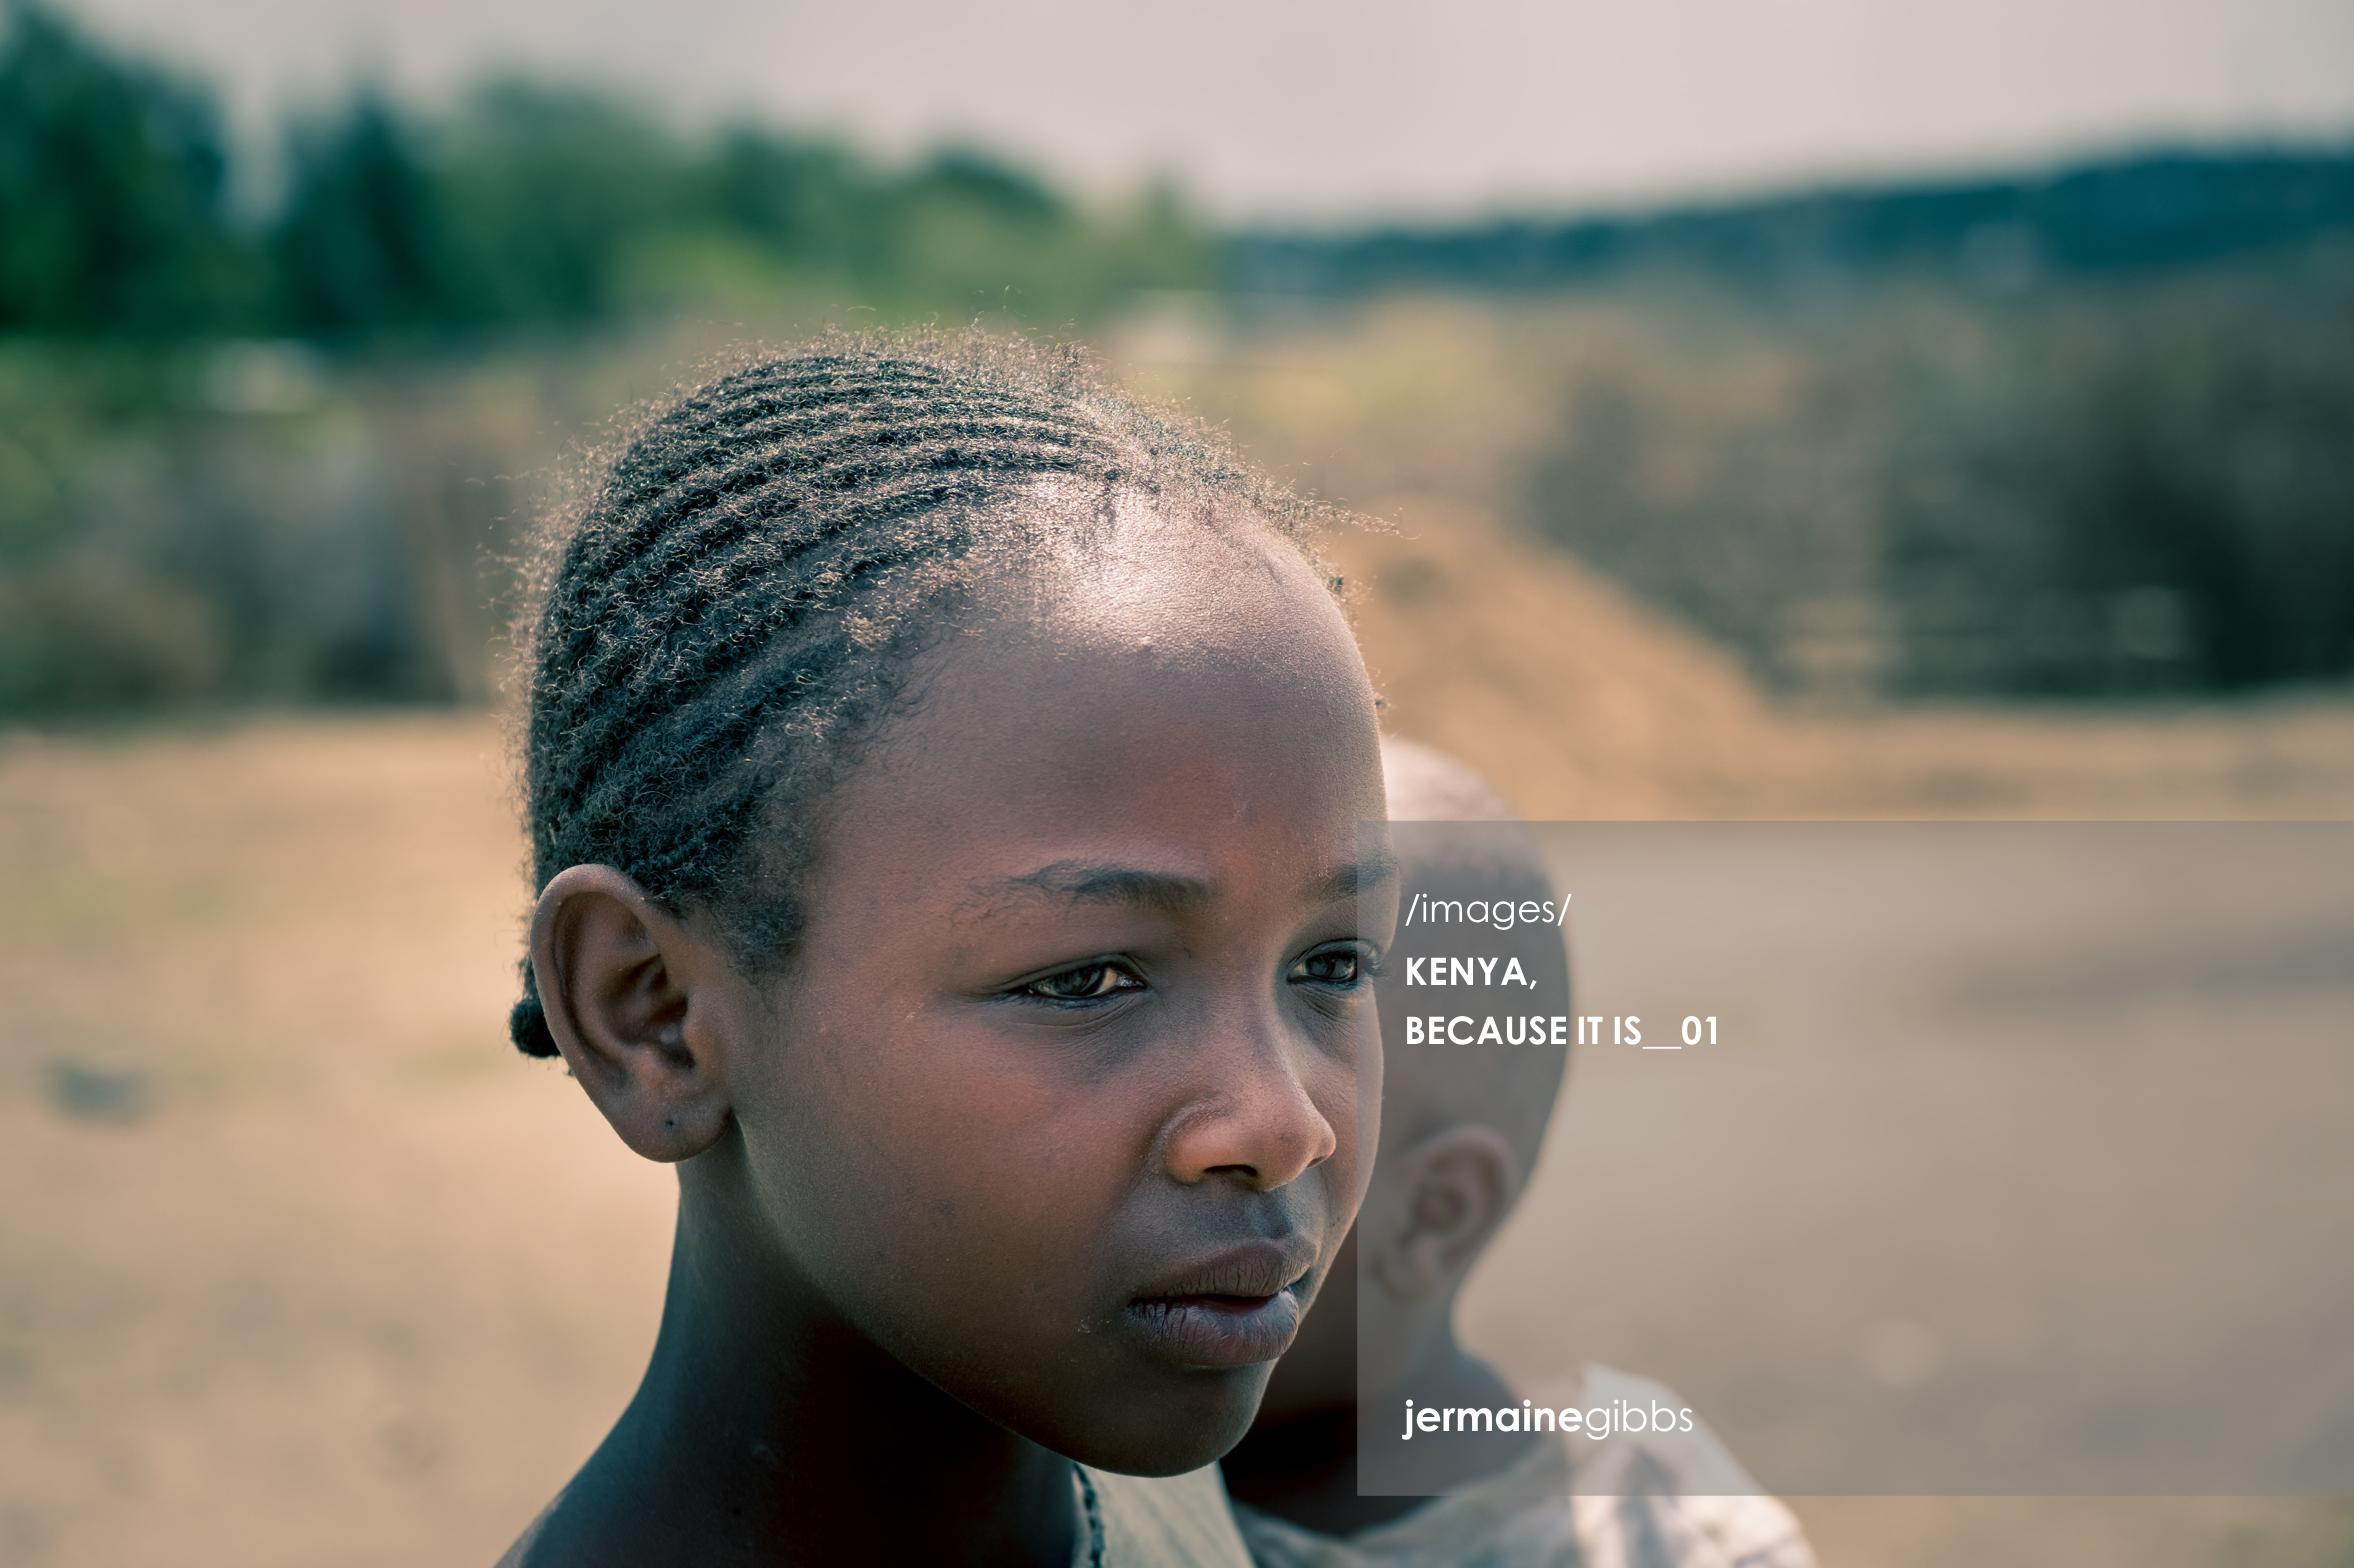 Kenya_Because It Is__01